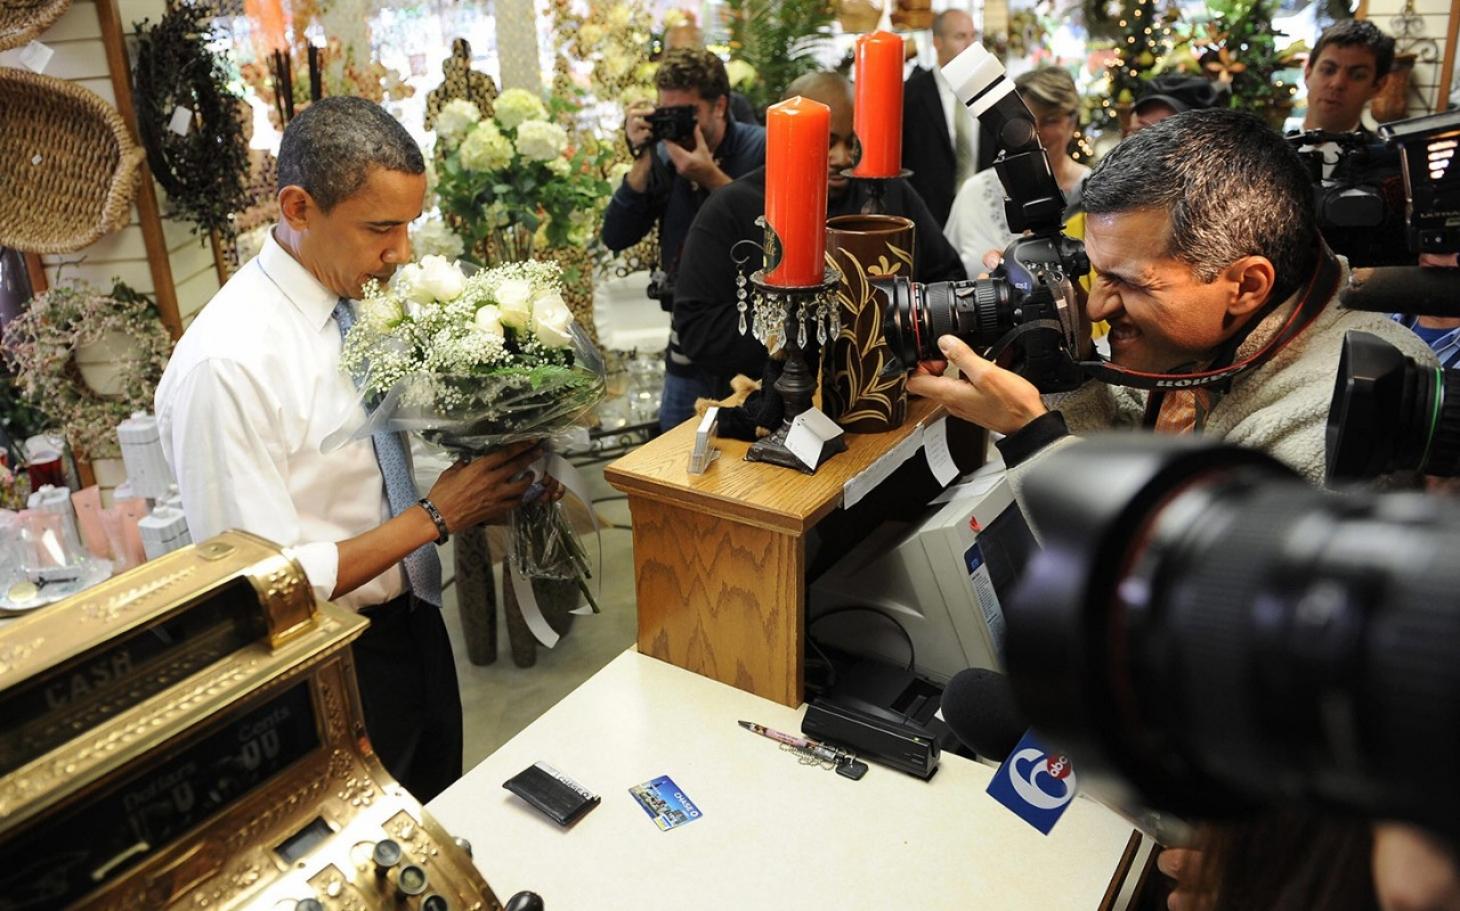 Body odor linked to love and politics   Al Jazeera America